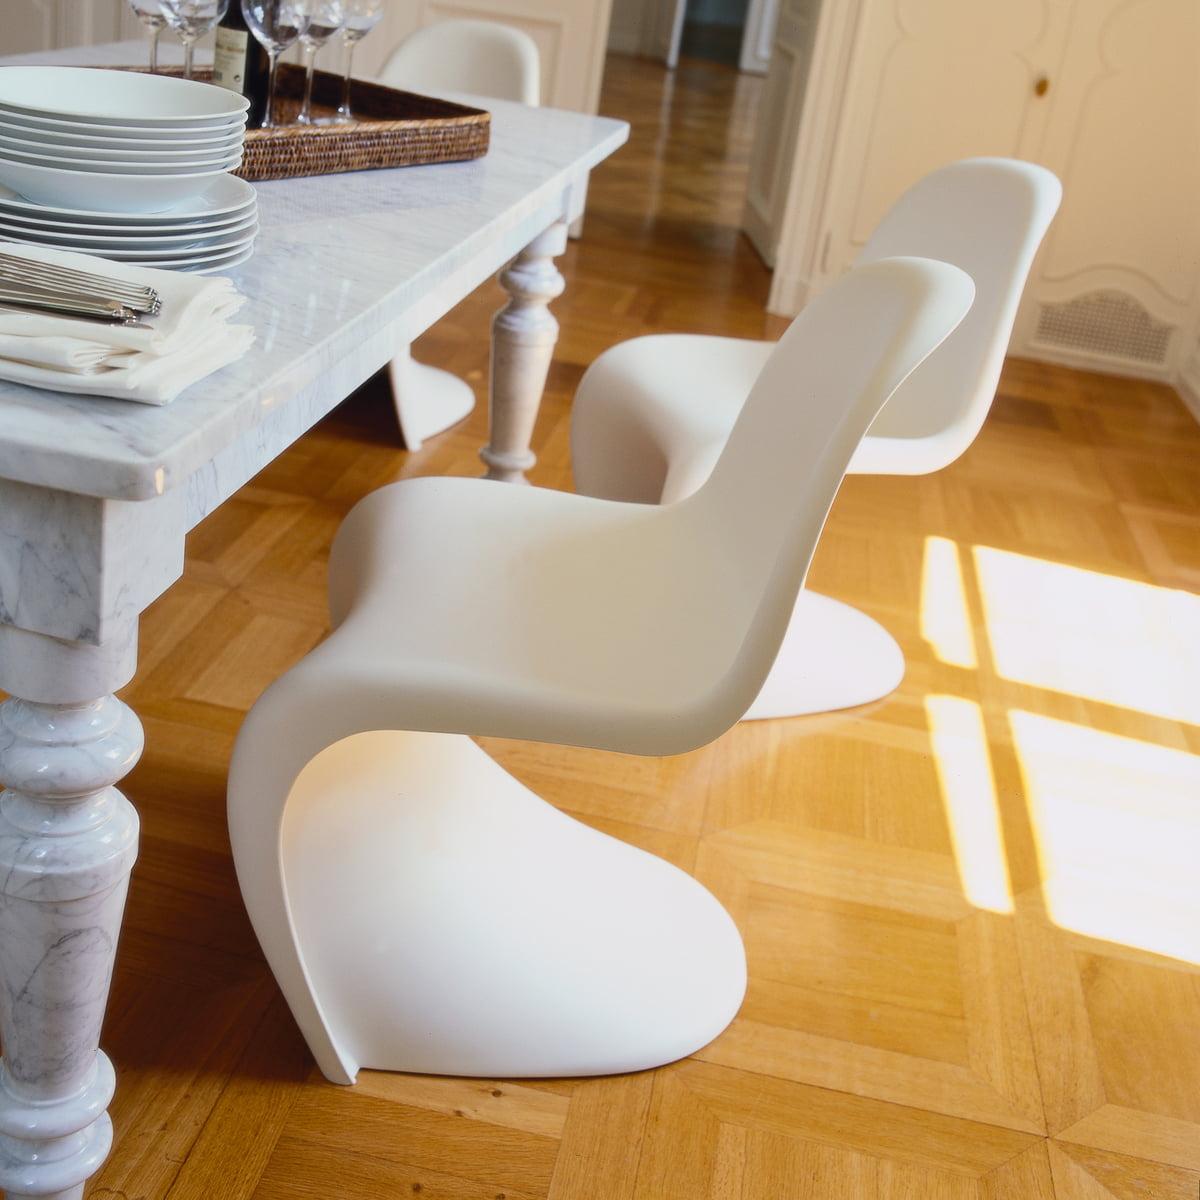 Panton chair original stuhl von vitra connox - Designer stuhl vitra ...